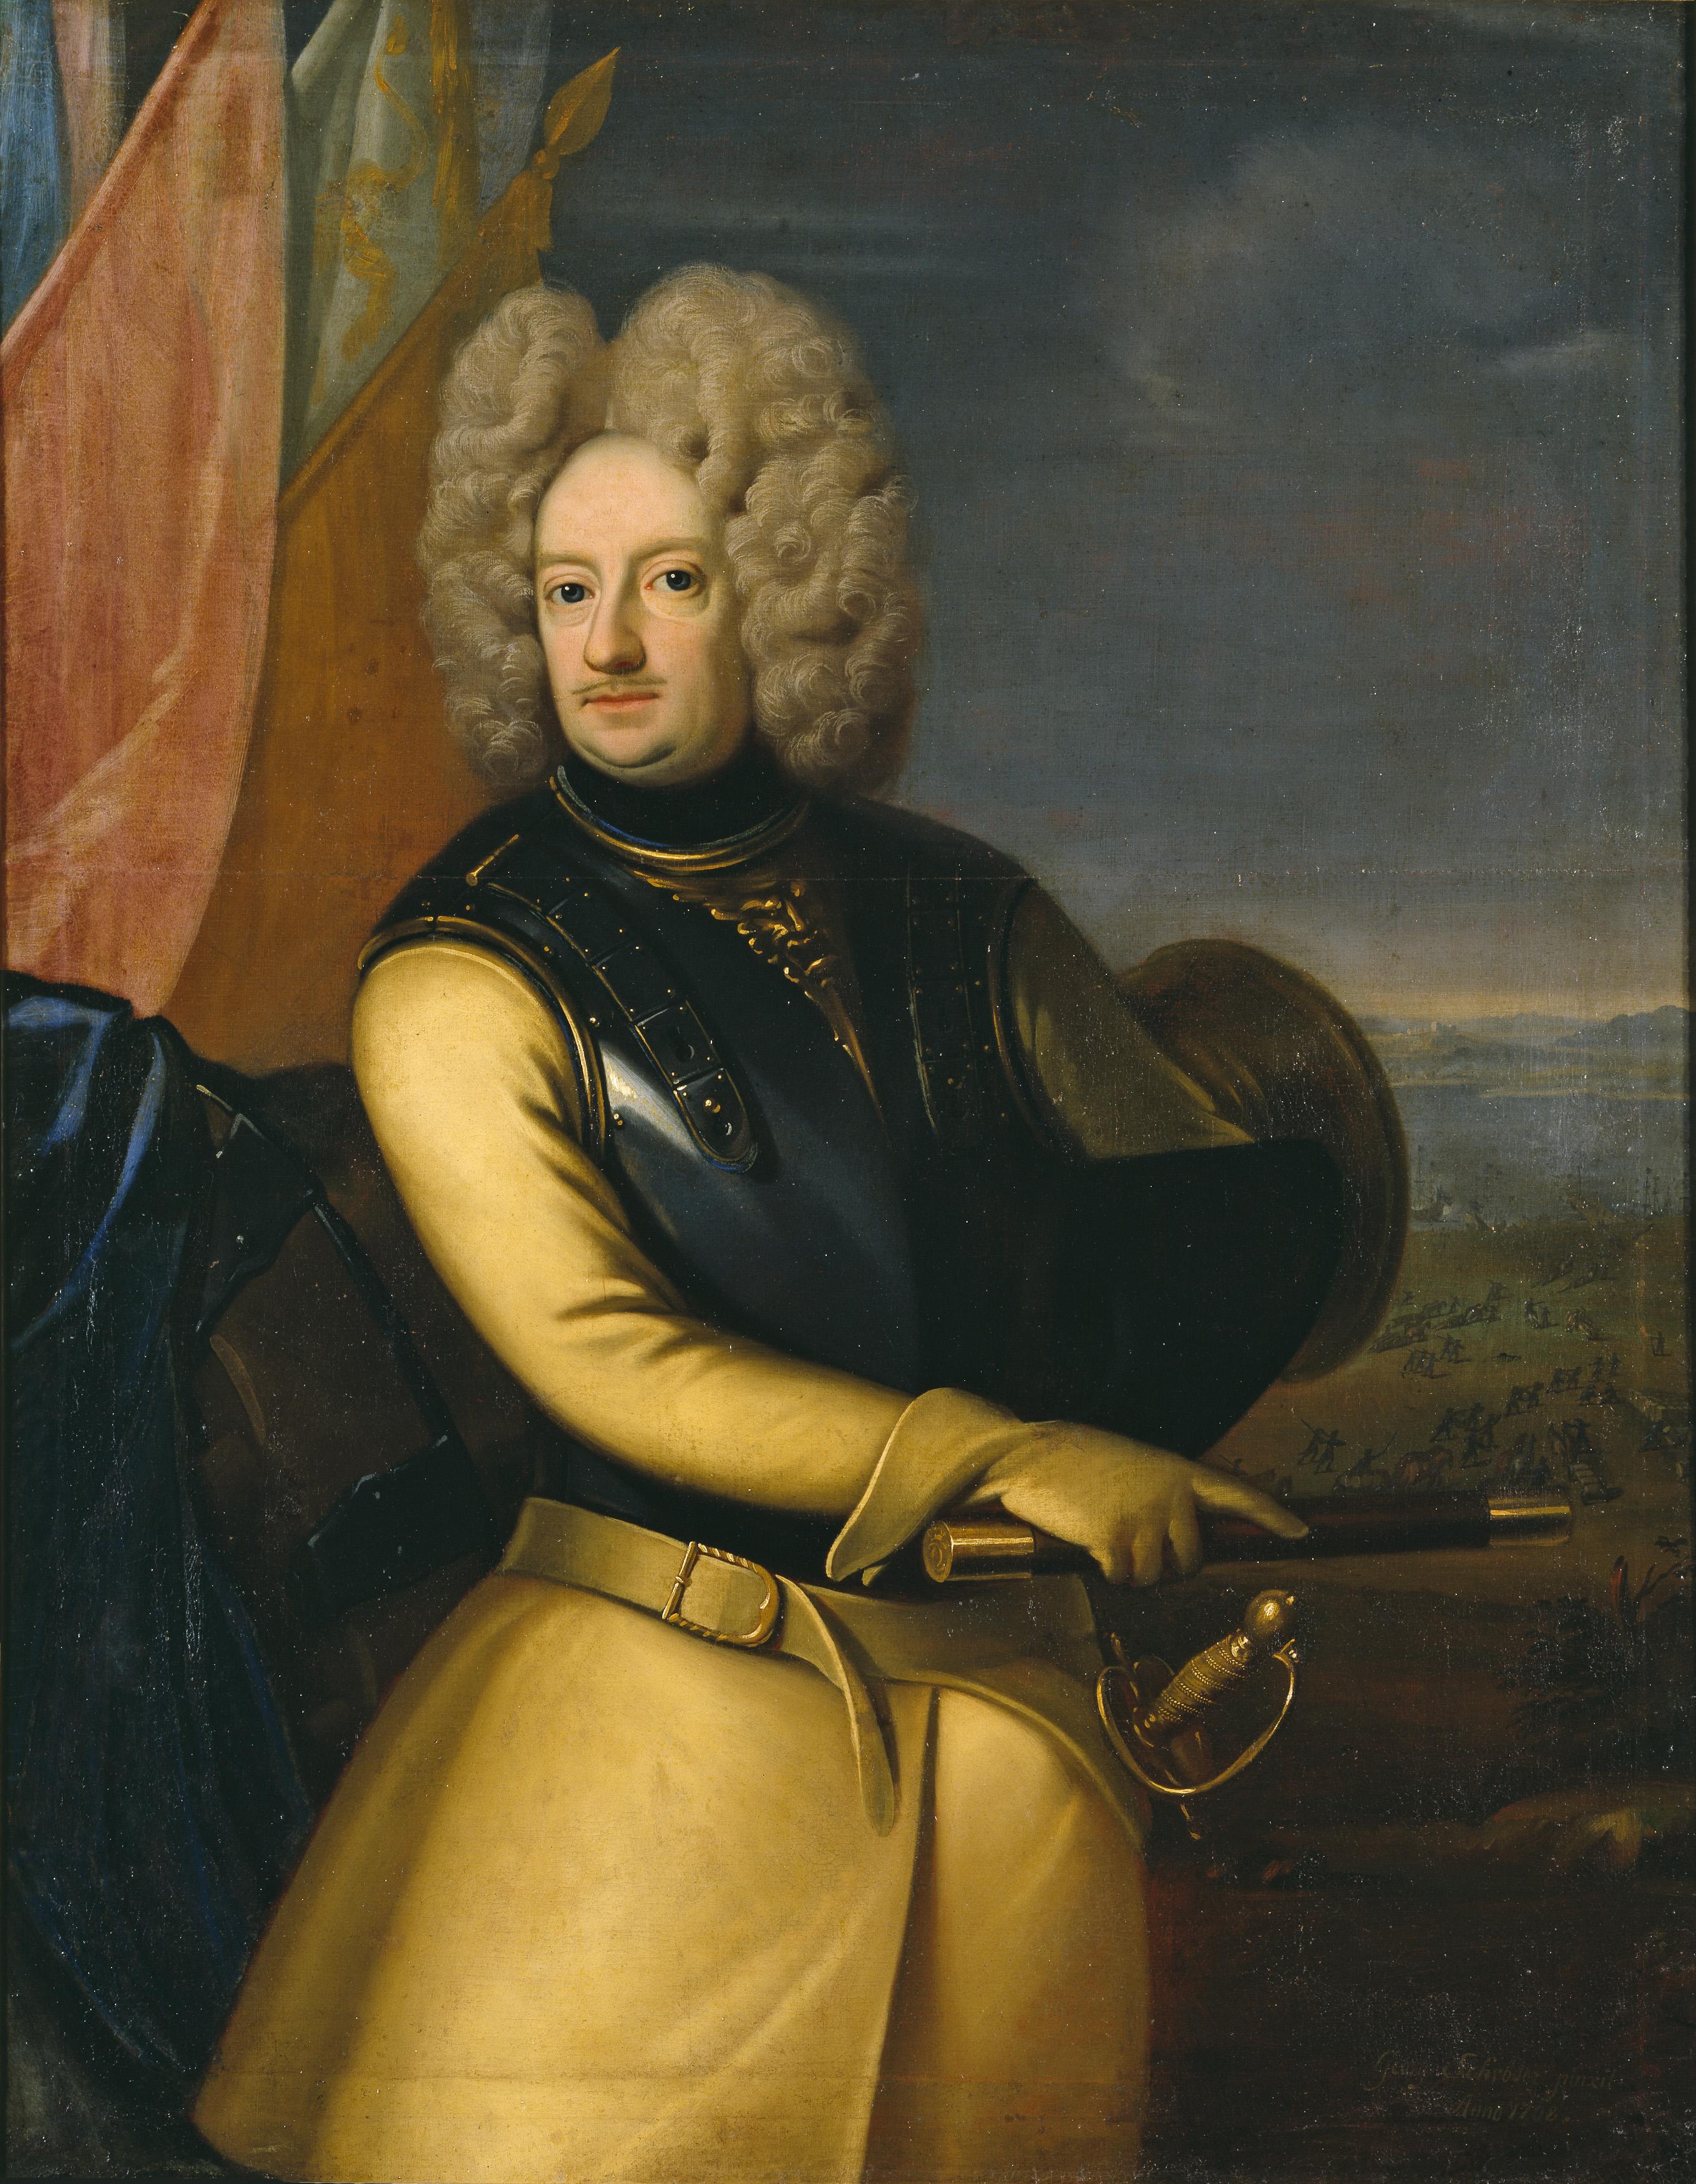 Magnus_Stenbock%2C_1665-1717.jpg